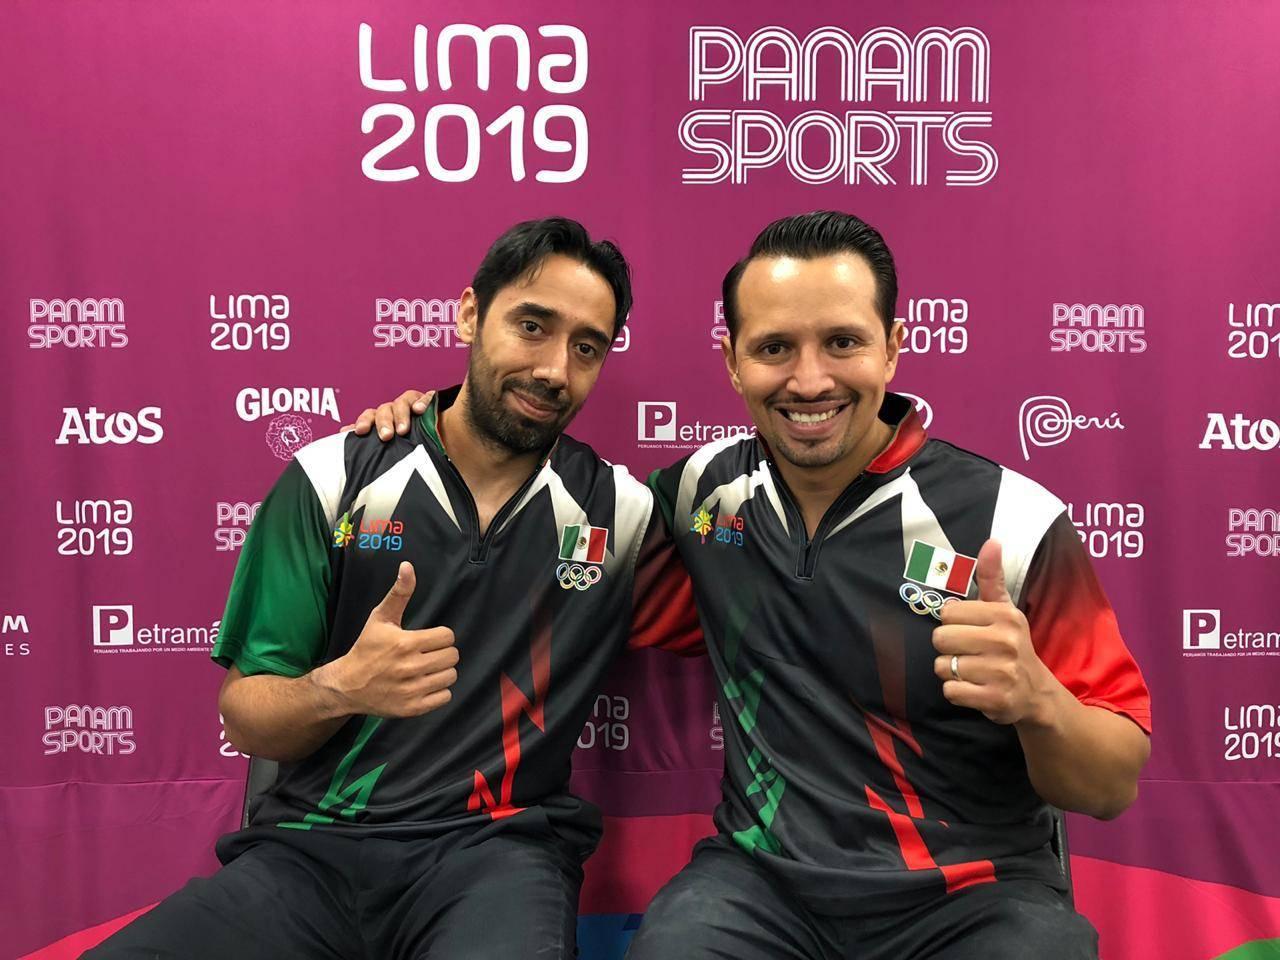 México gana bronce en Lima por doping de atleta puertorriqueño